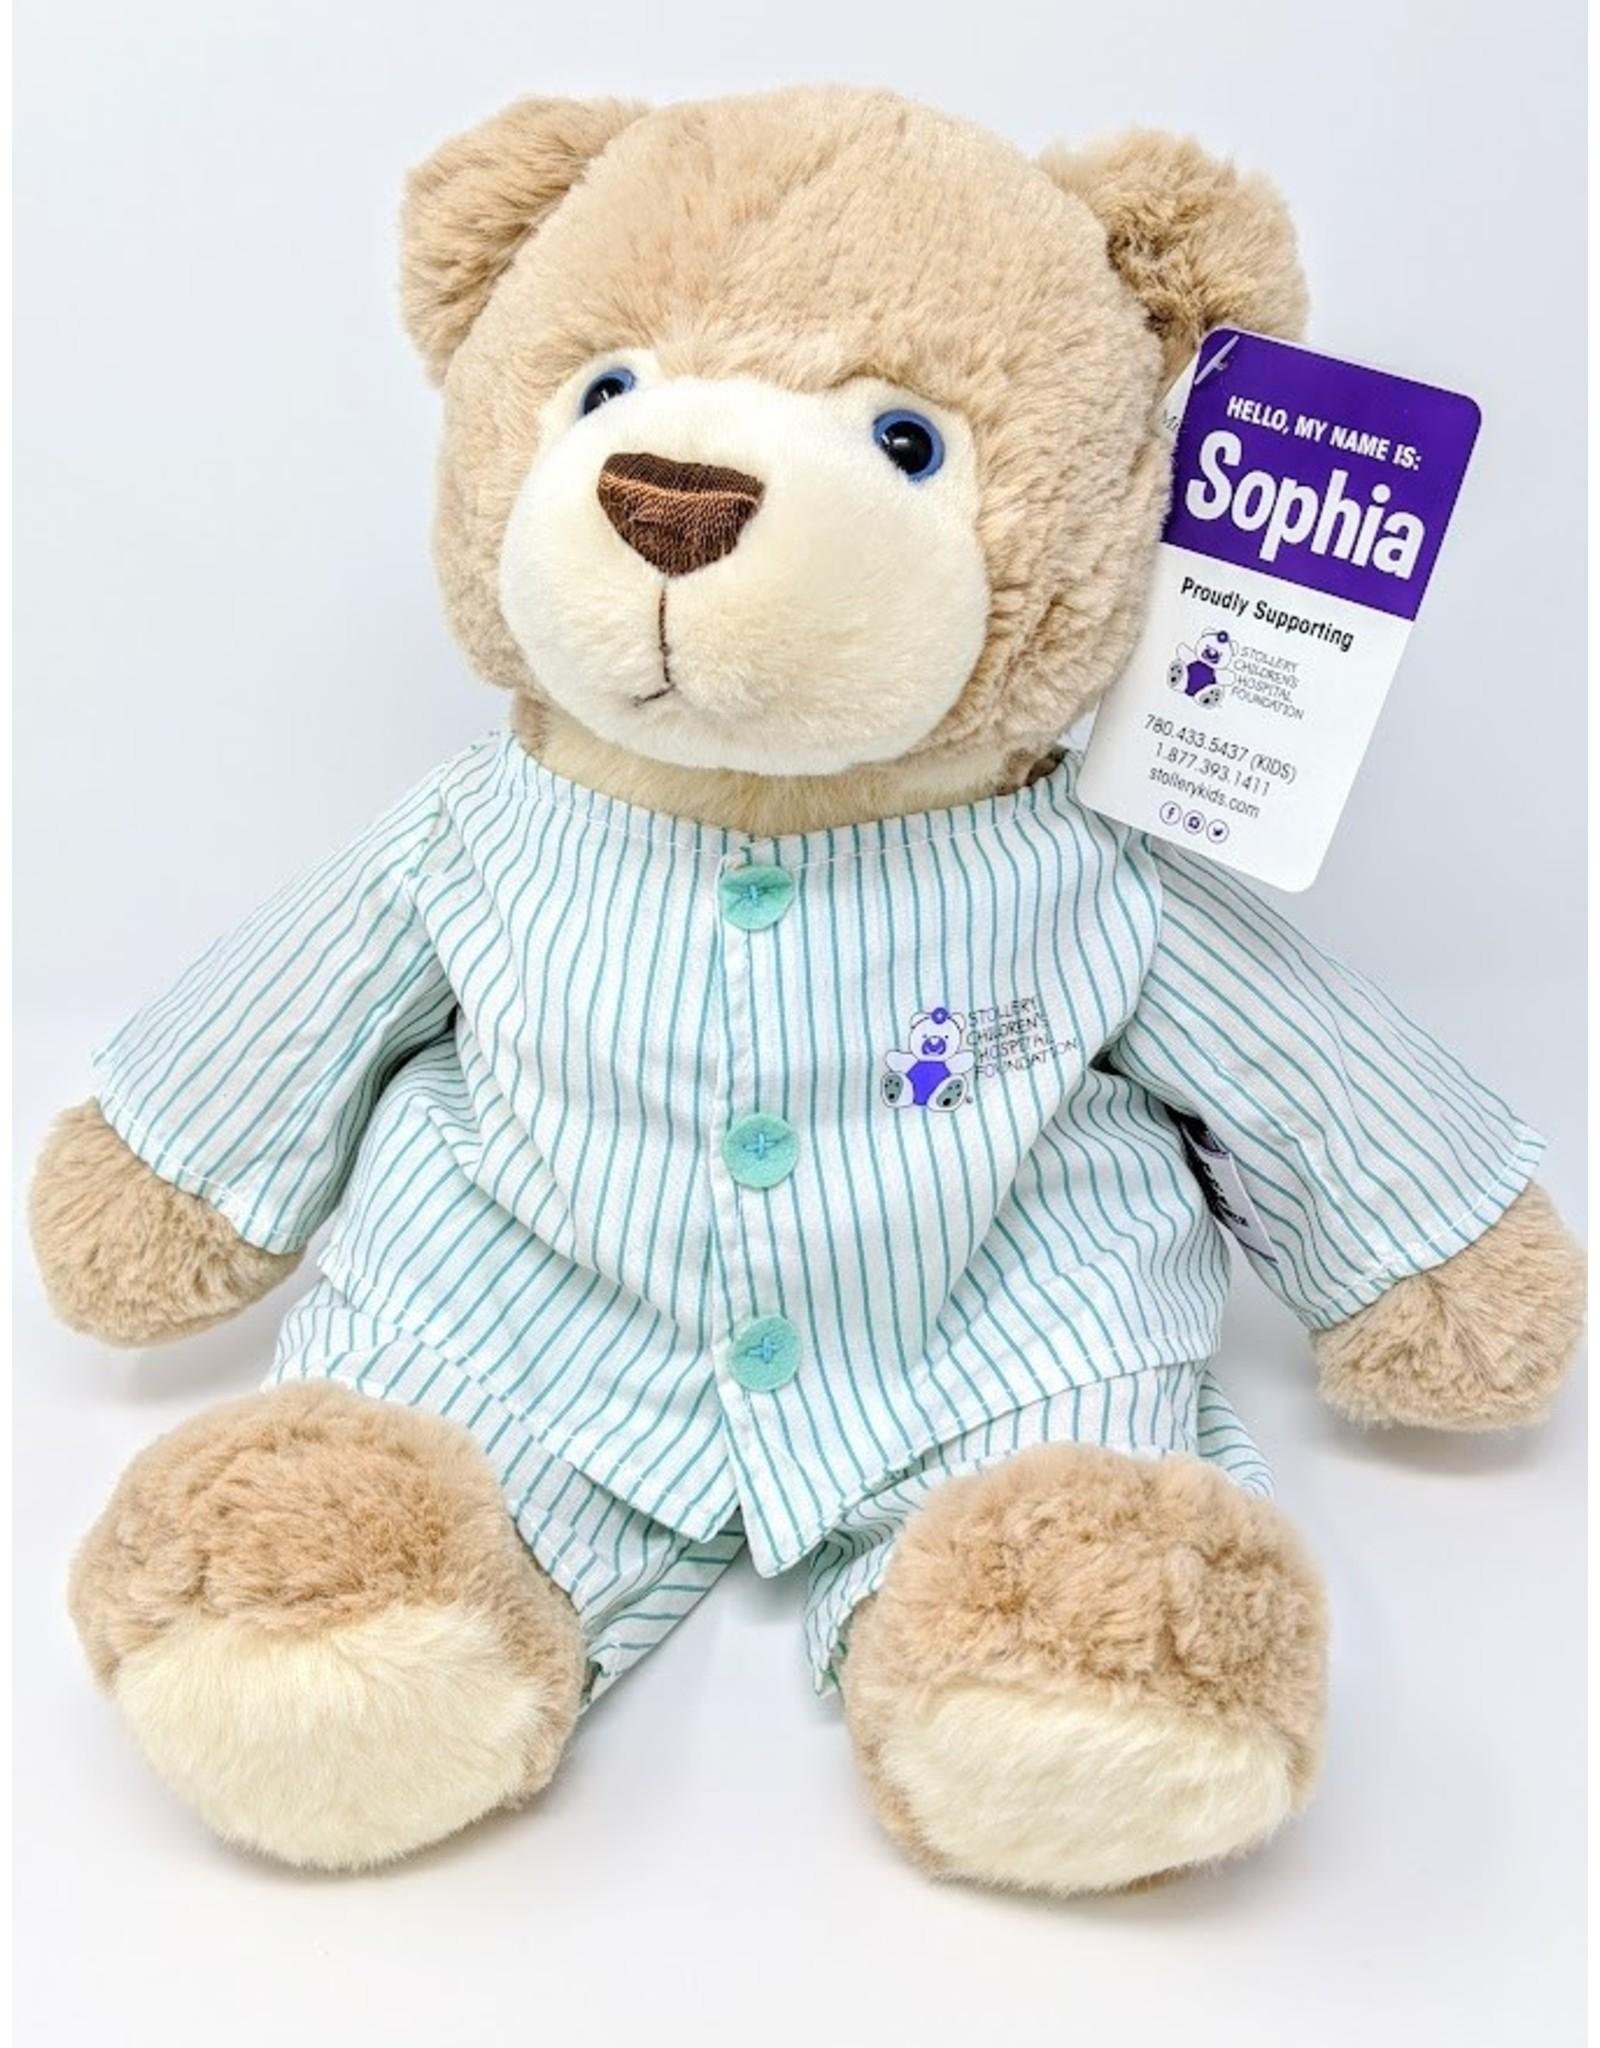 GUND Sophia Dressed